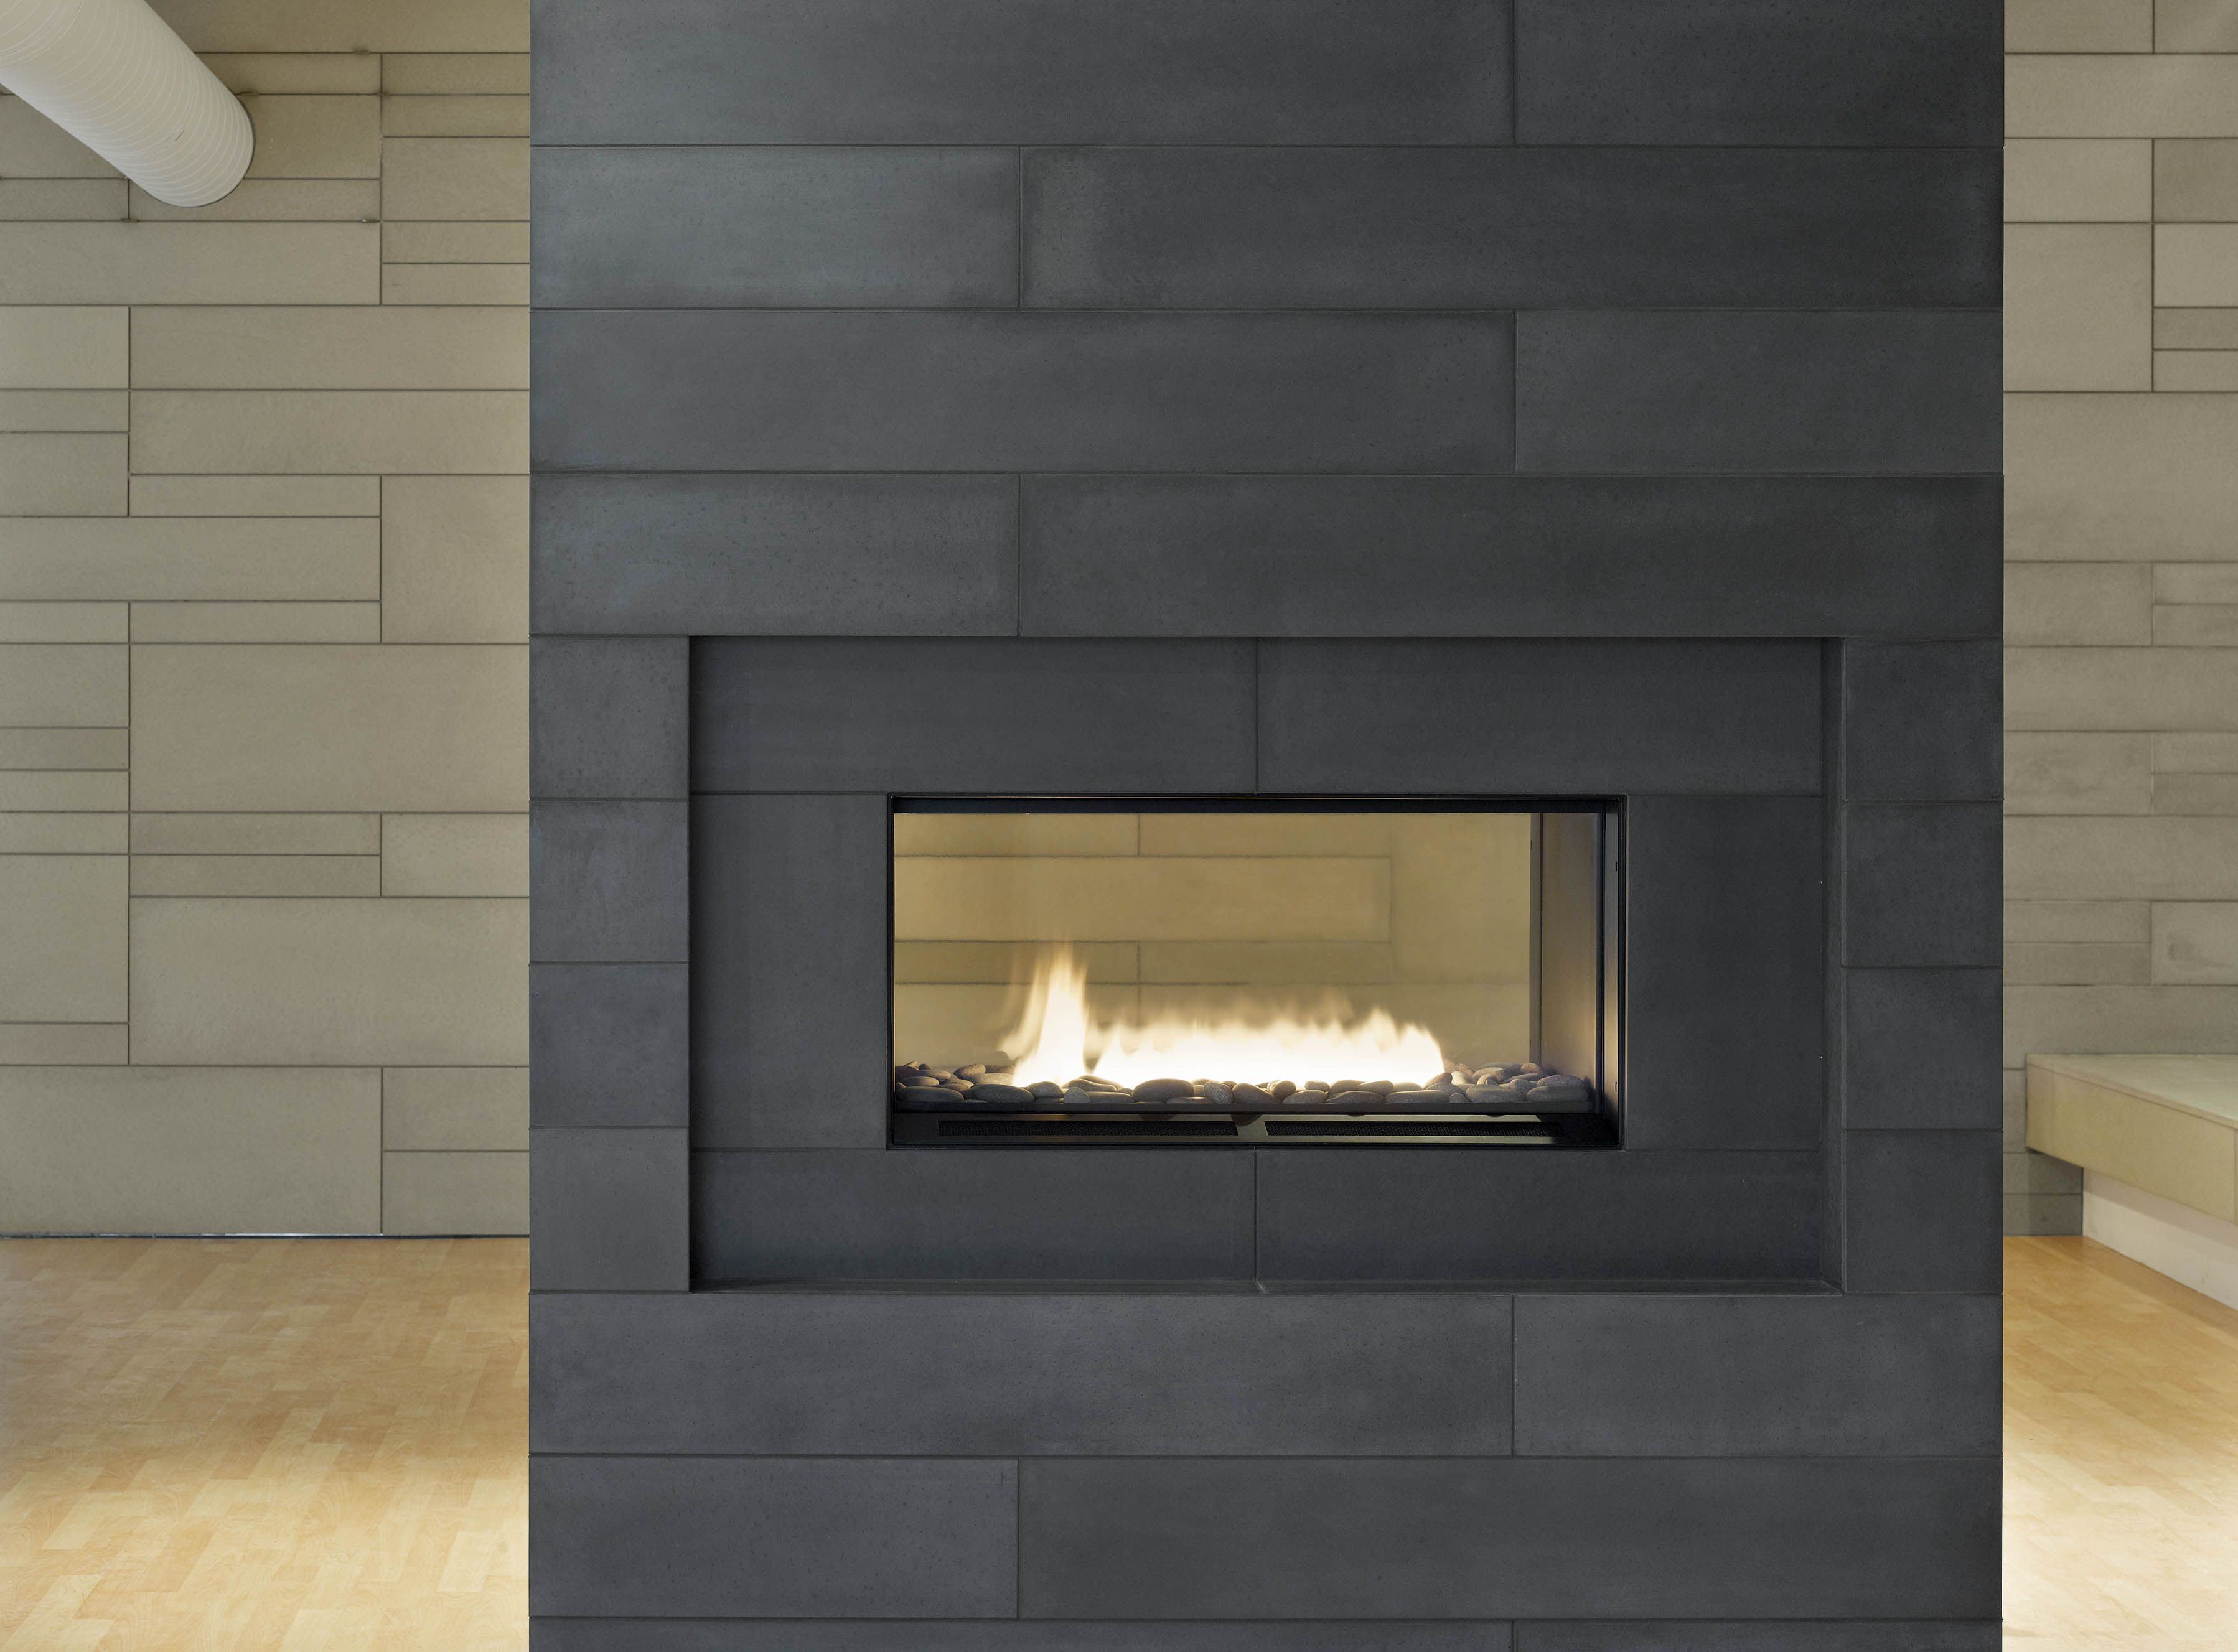 Tiled Fireplace Modern Fireplace Fireplace Tile Surround